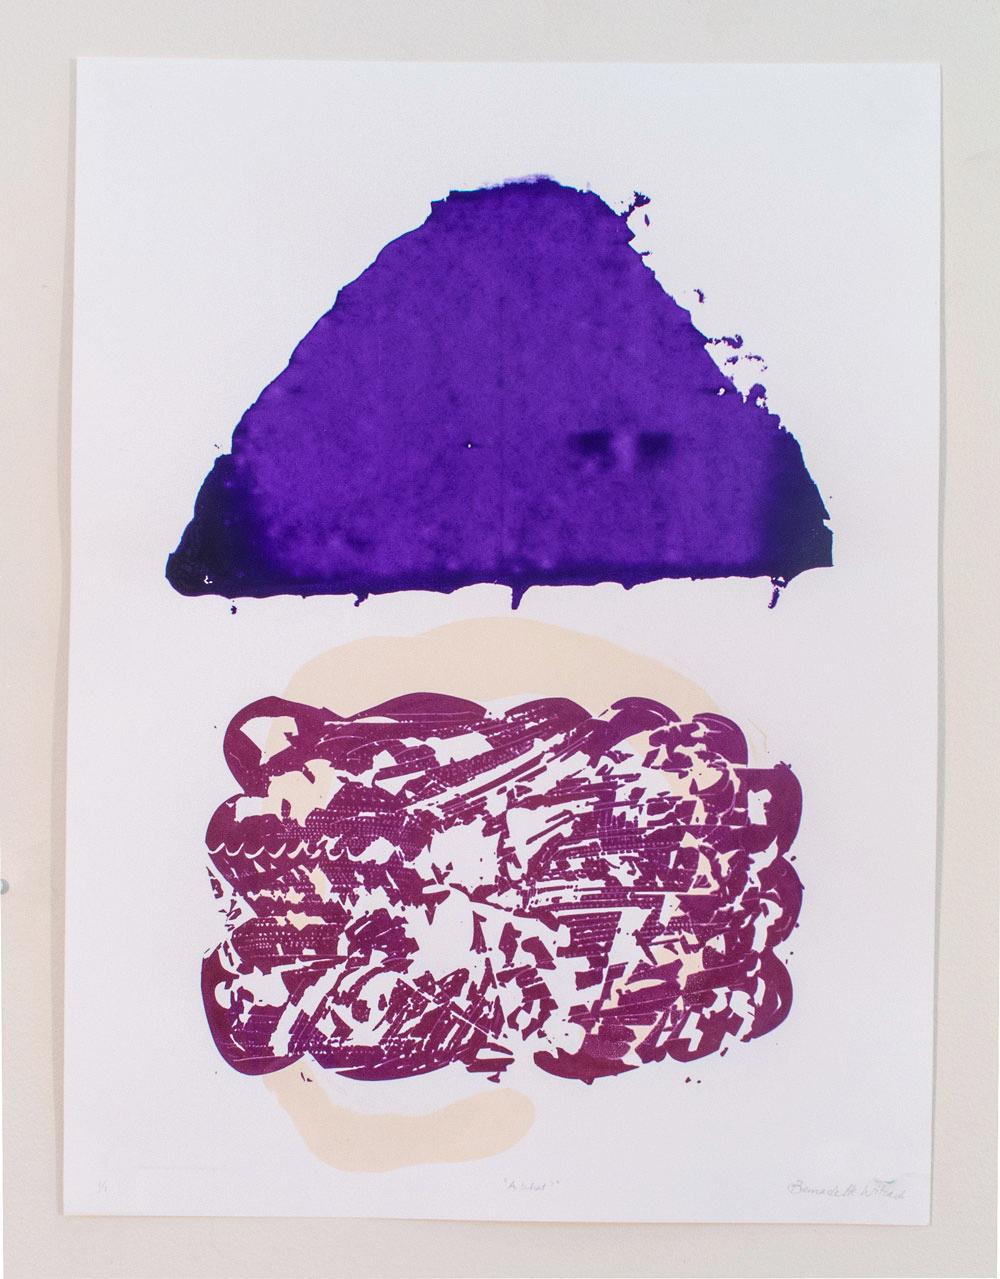 Witzack_purple-house-rubylith.jpg